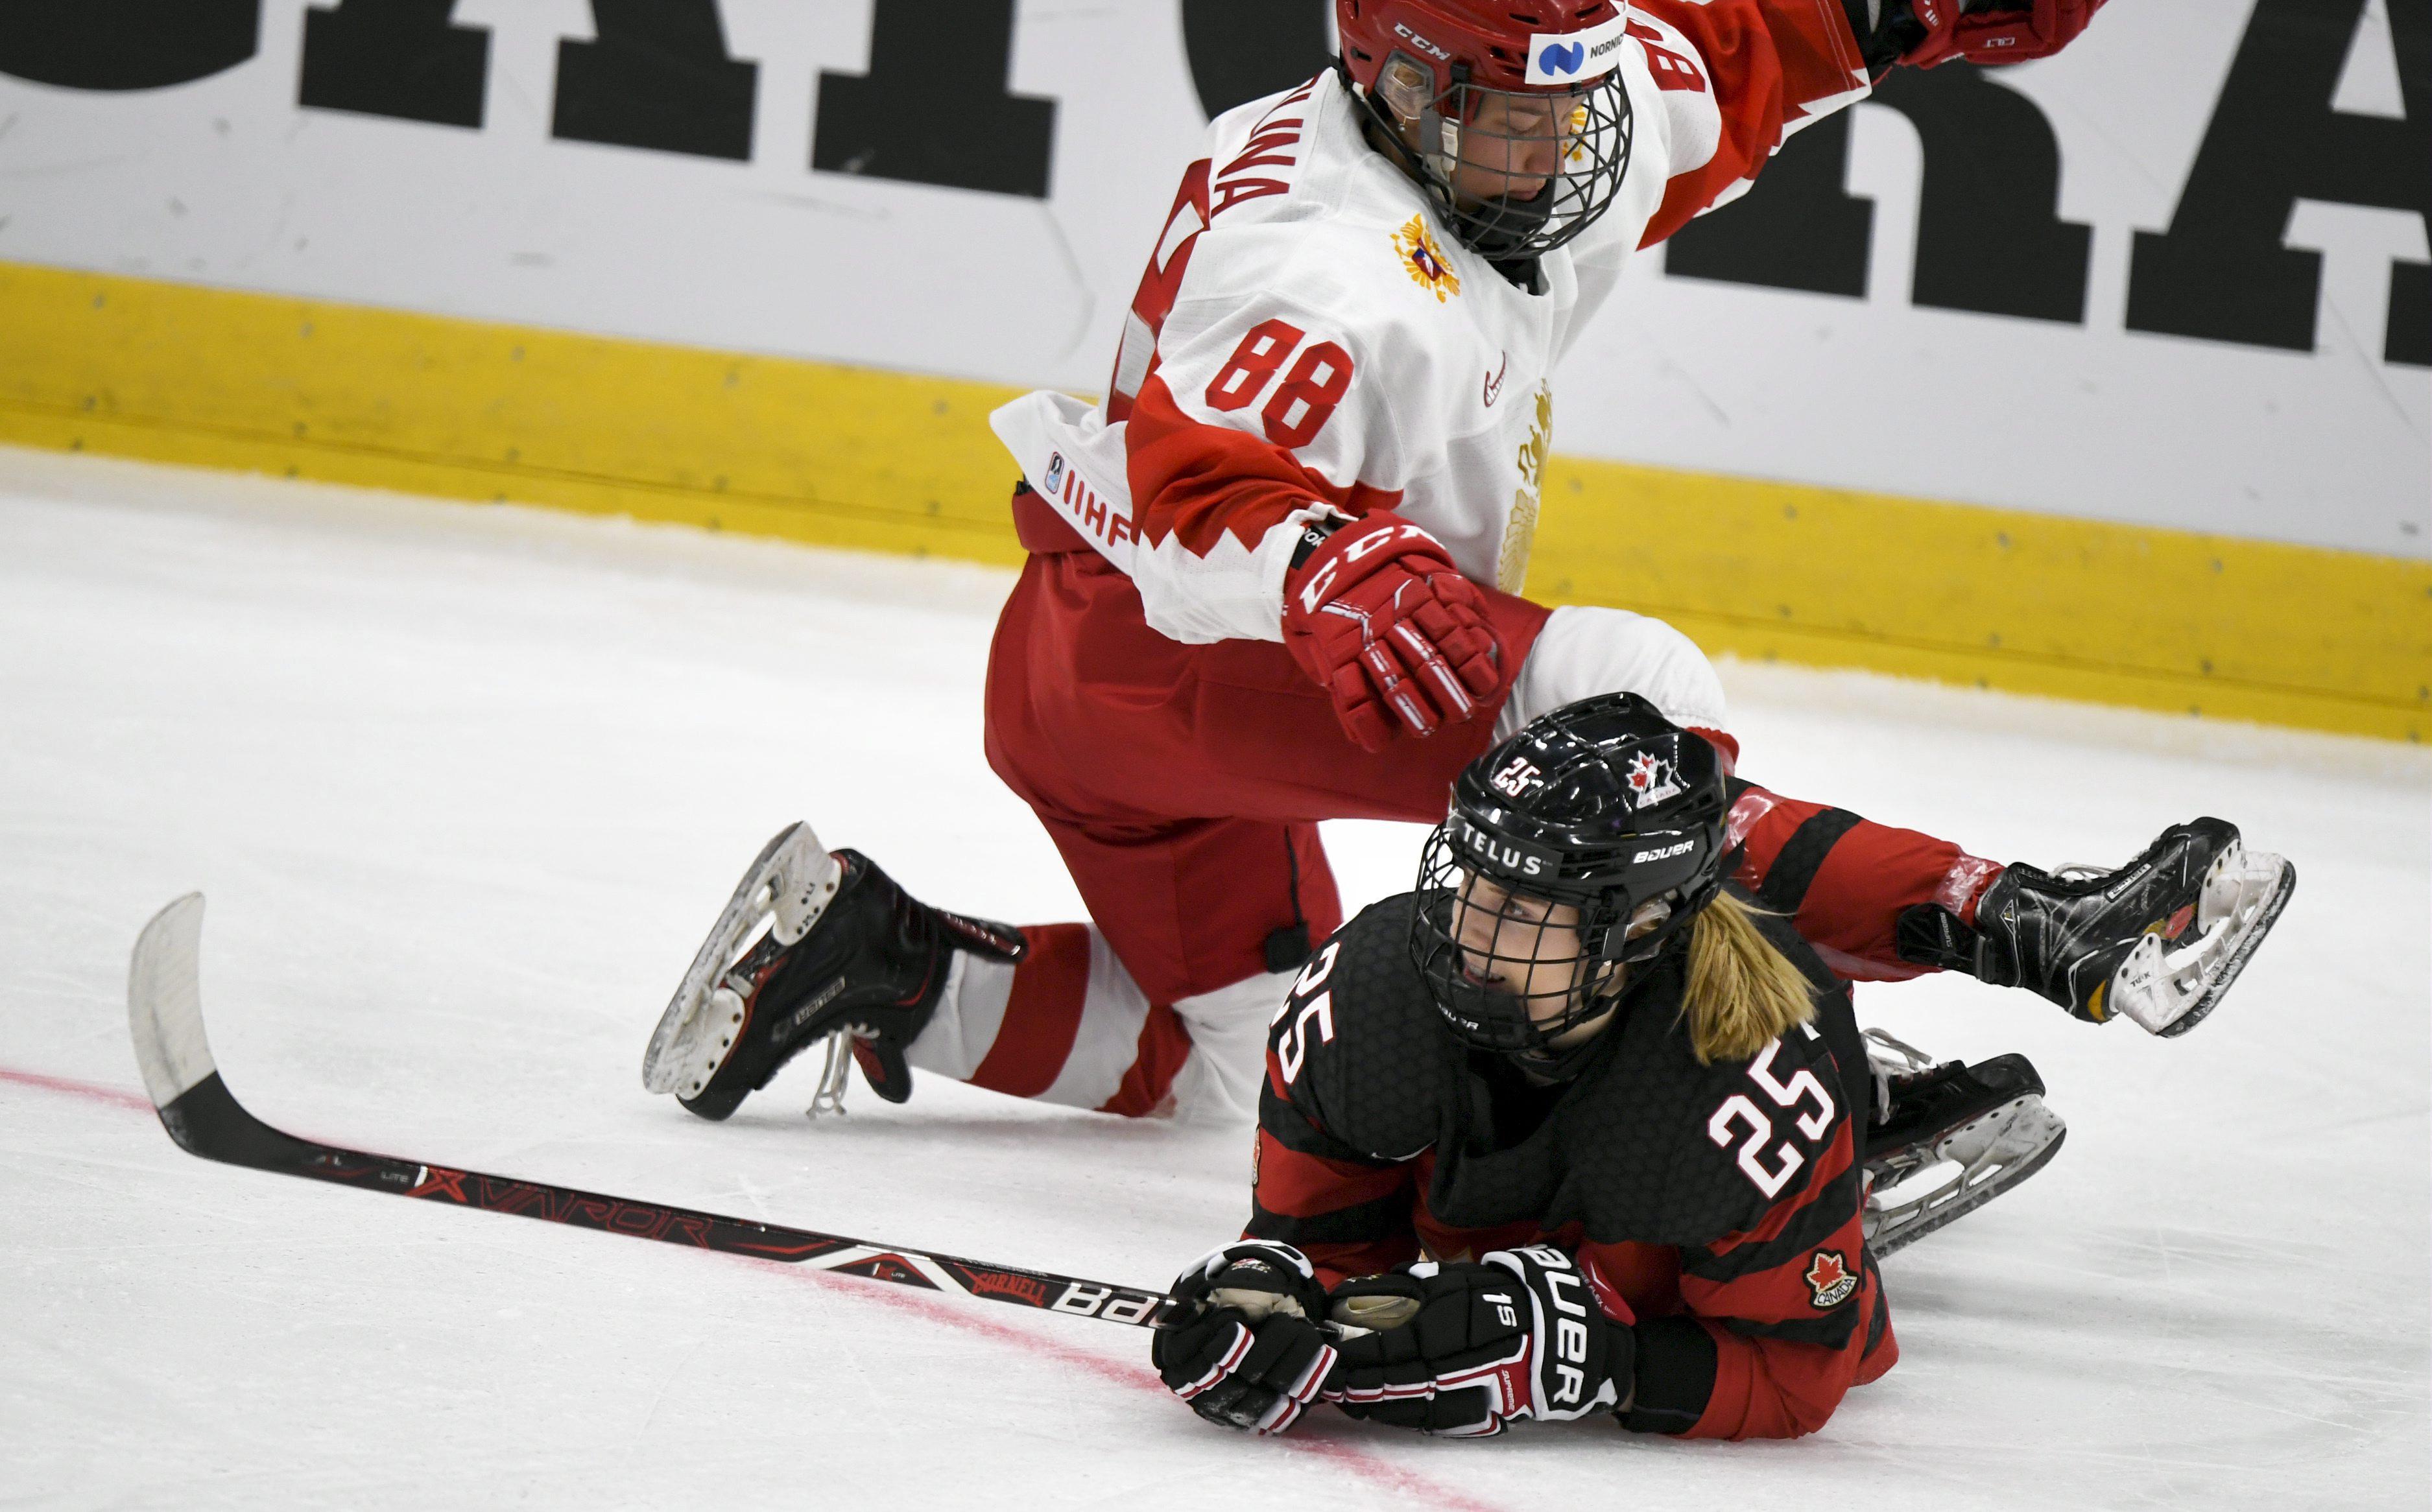 IHOCKEY-WC-IIHF-CAN-RUS